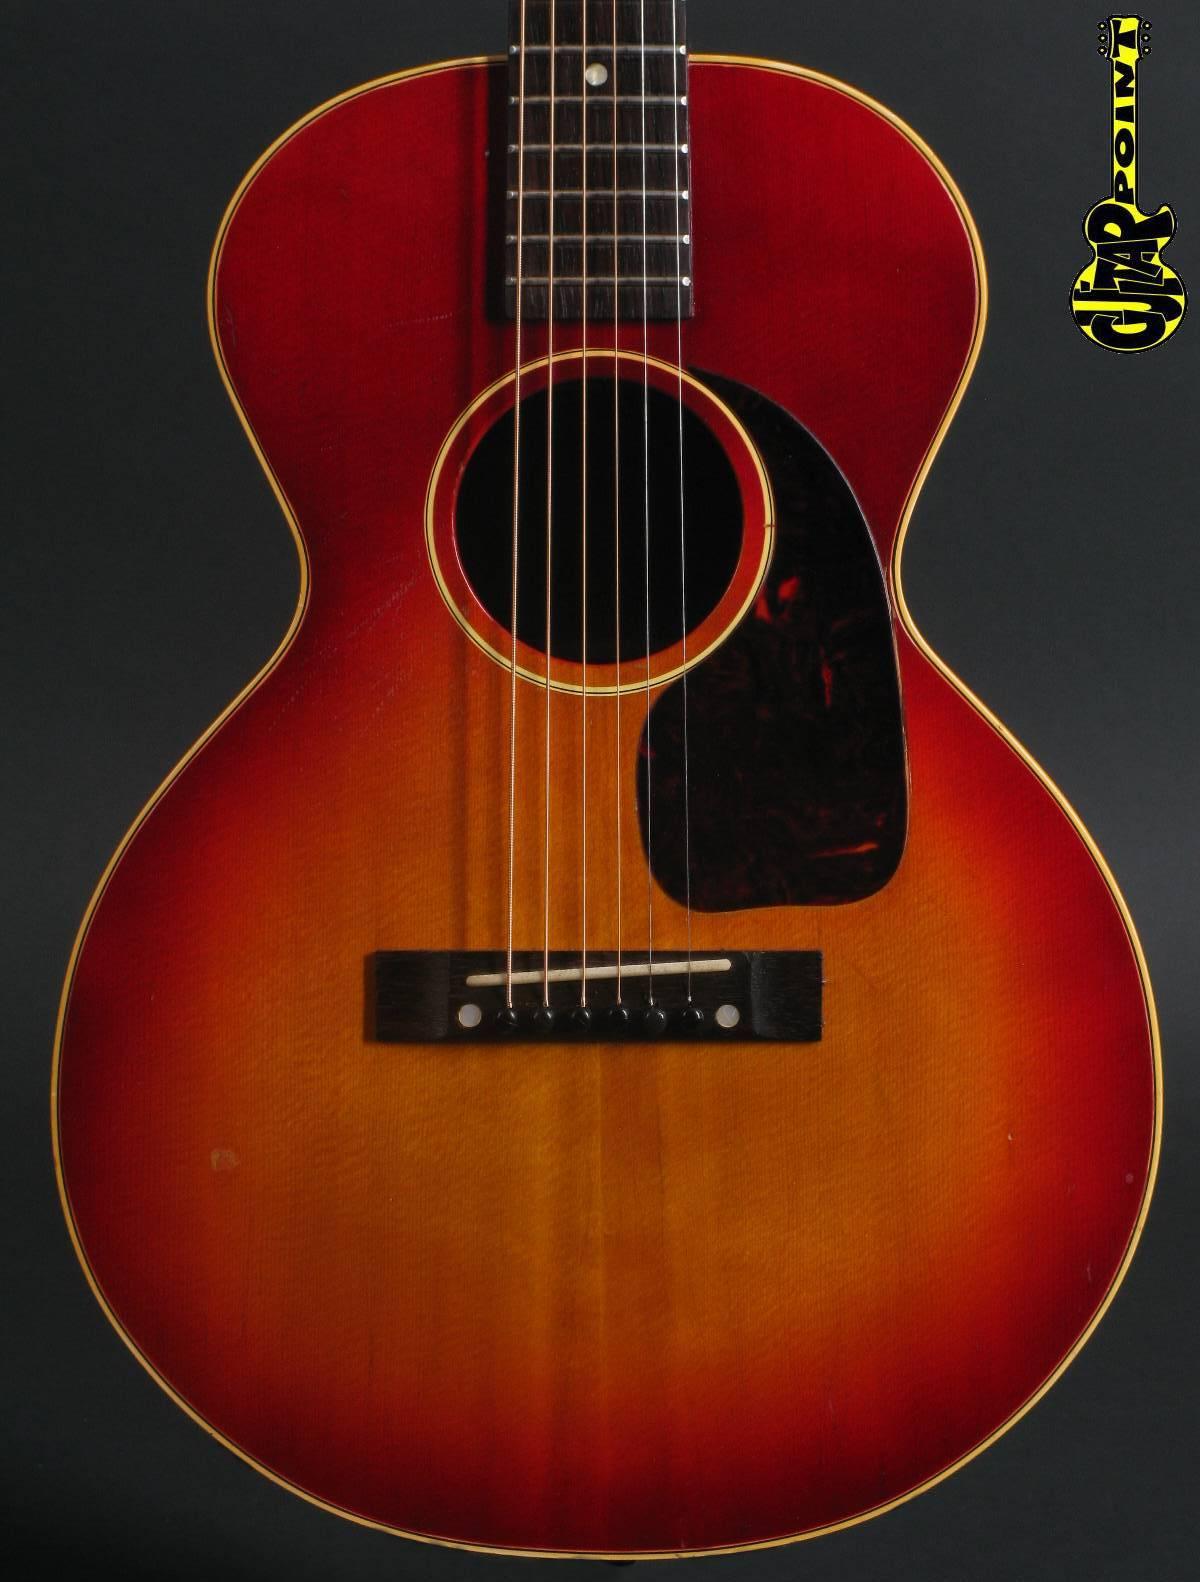 1960 Gibson LG-2 - Sunburst